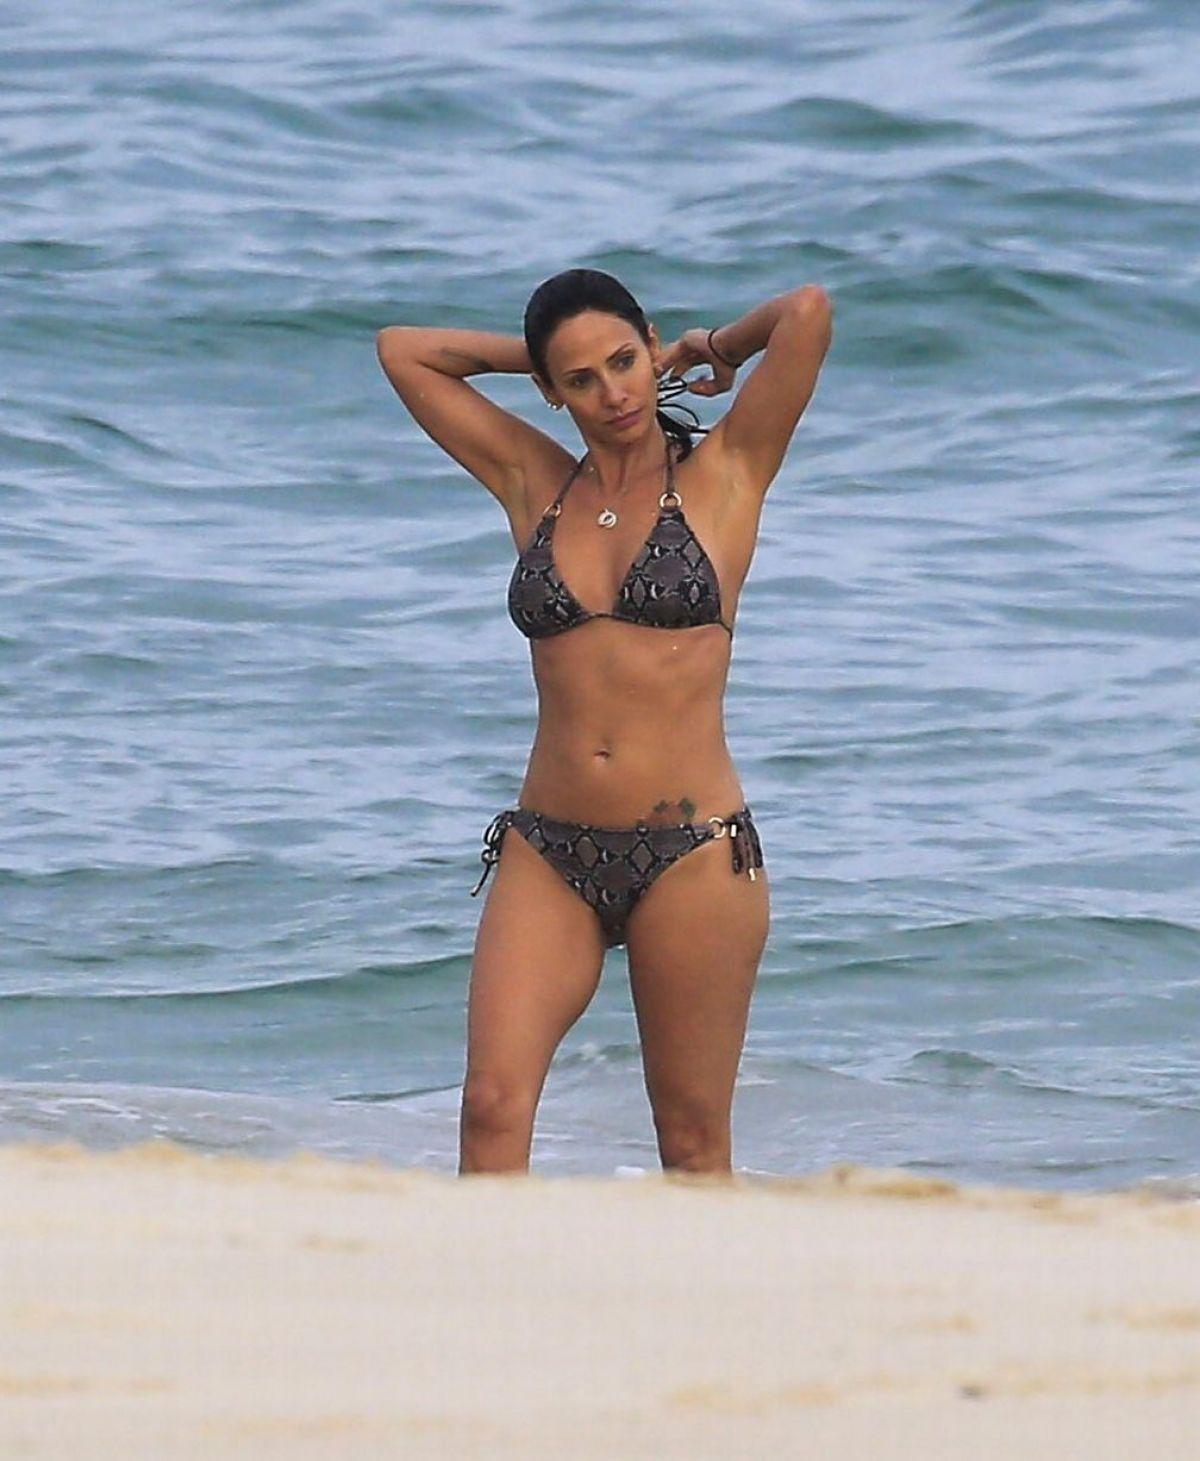 Bikini Natalie Imbruglia nudes (95 photo), Sexy, Bikini, Twitter, lingerie 2015